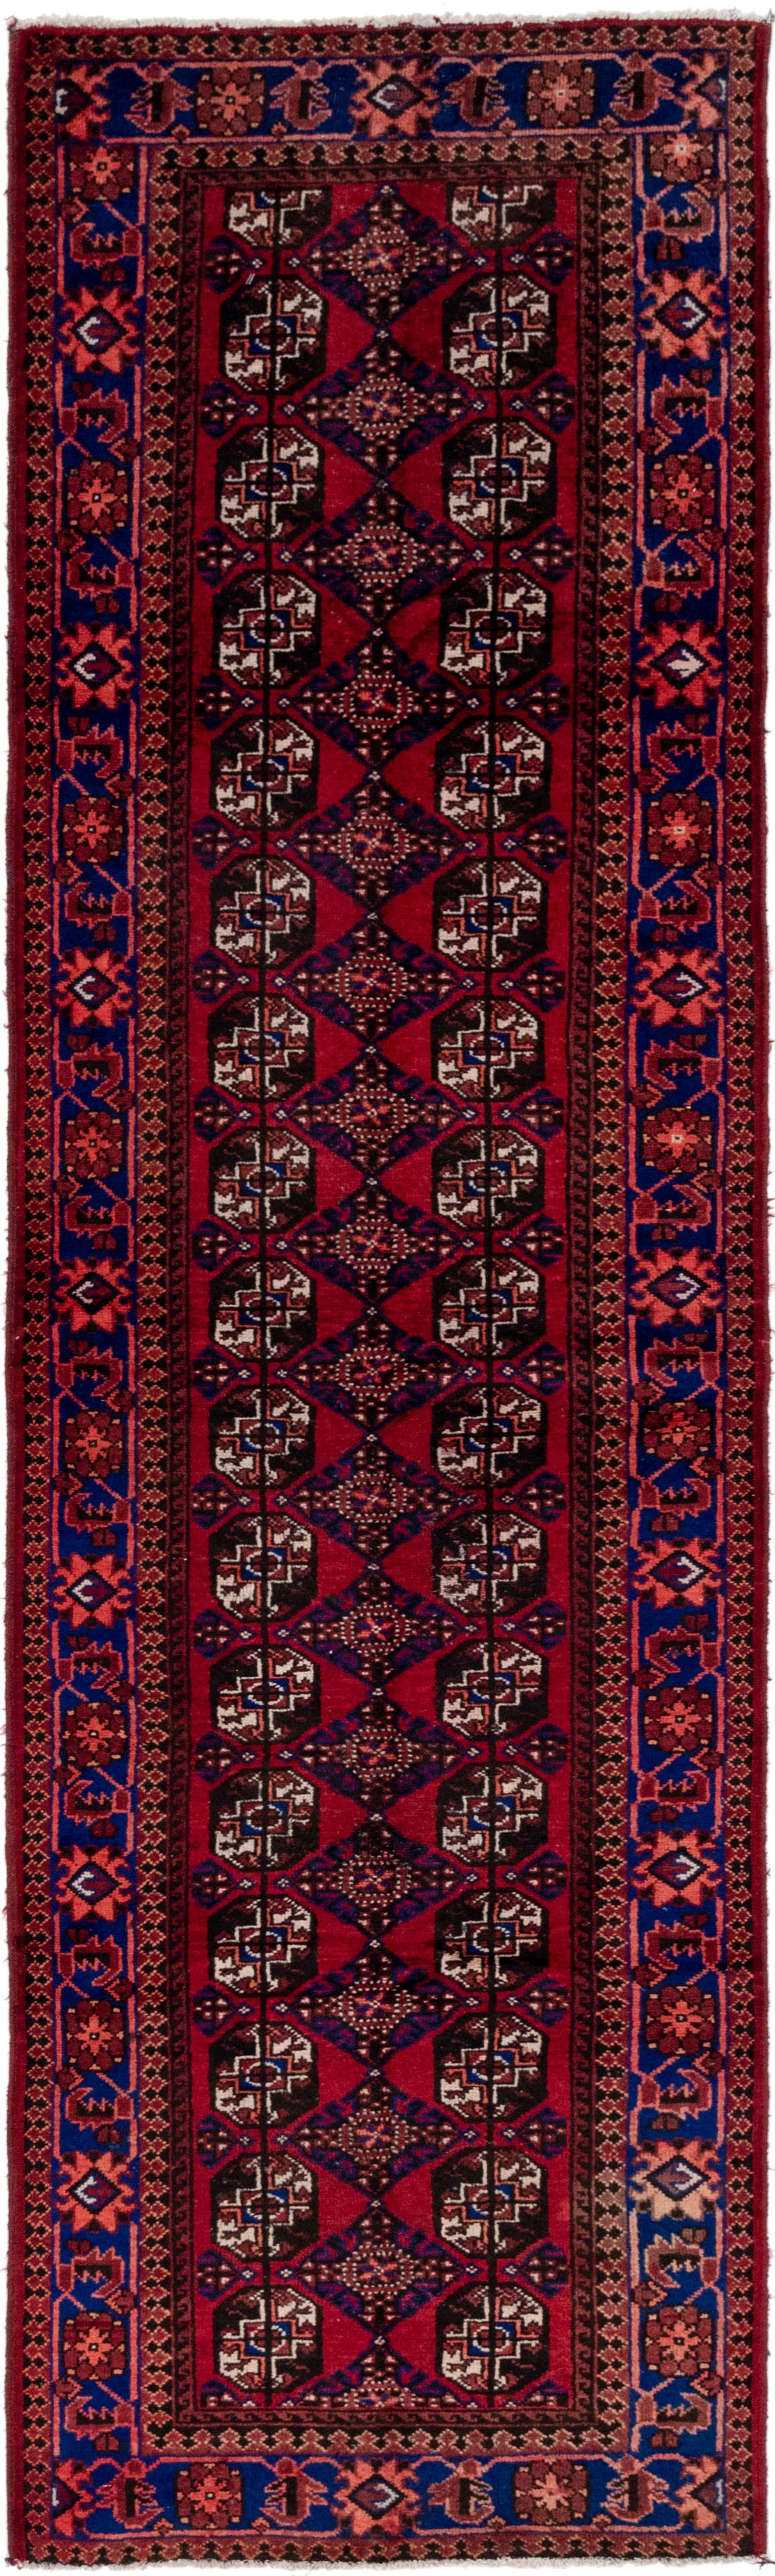 3' 4 x 12' 8 Balouch Persian Runner Rug main image